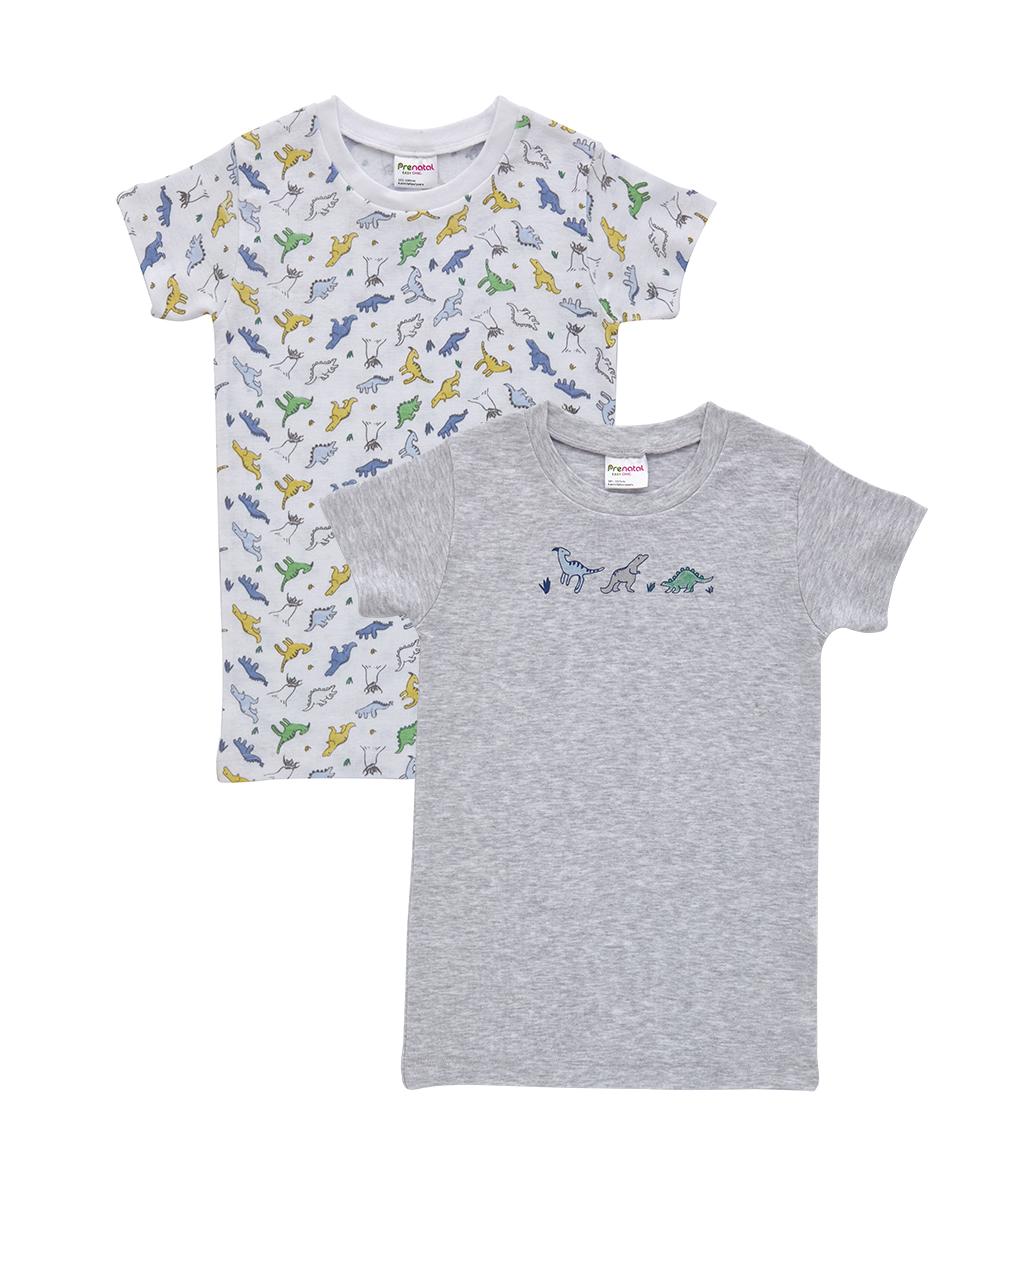 T-shirt Πακέτο Χ2 με Δεινόσαυρους για Αγόρι